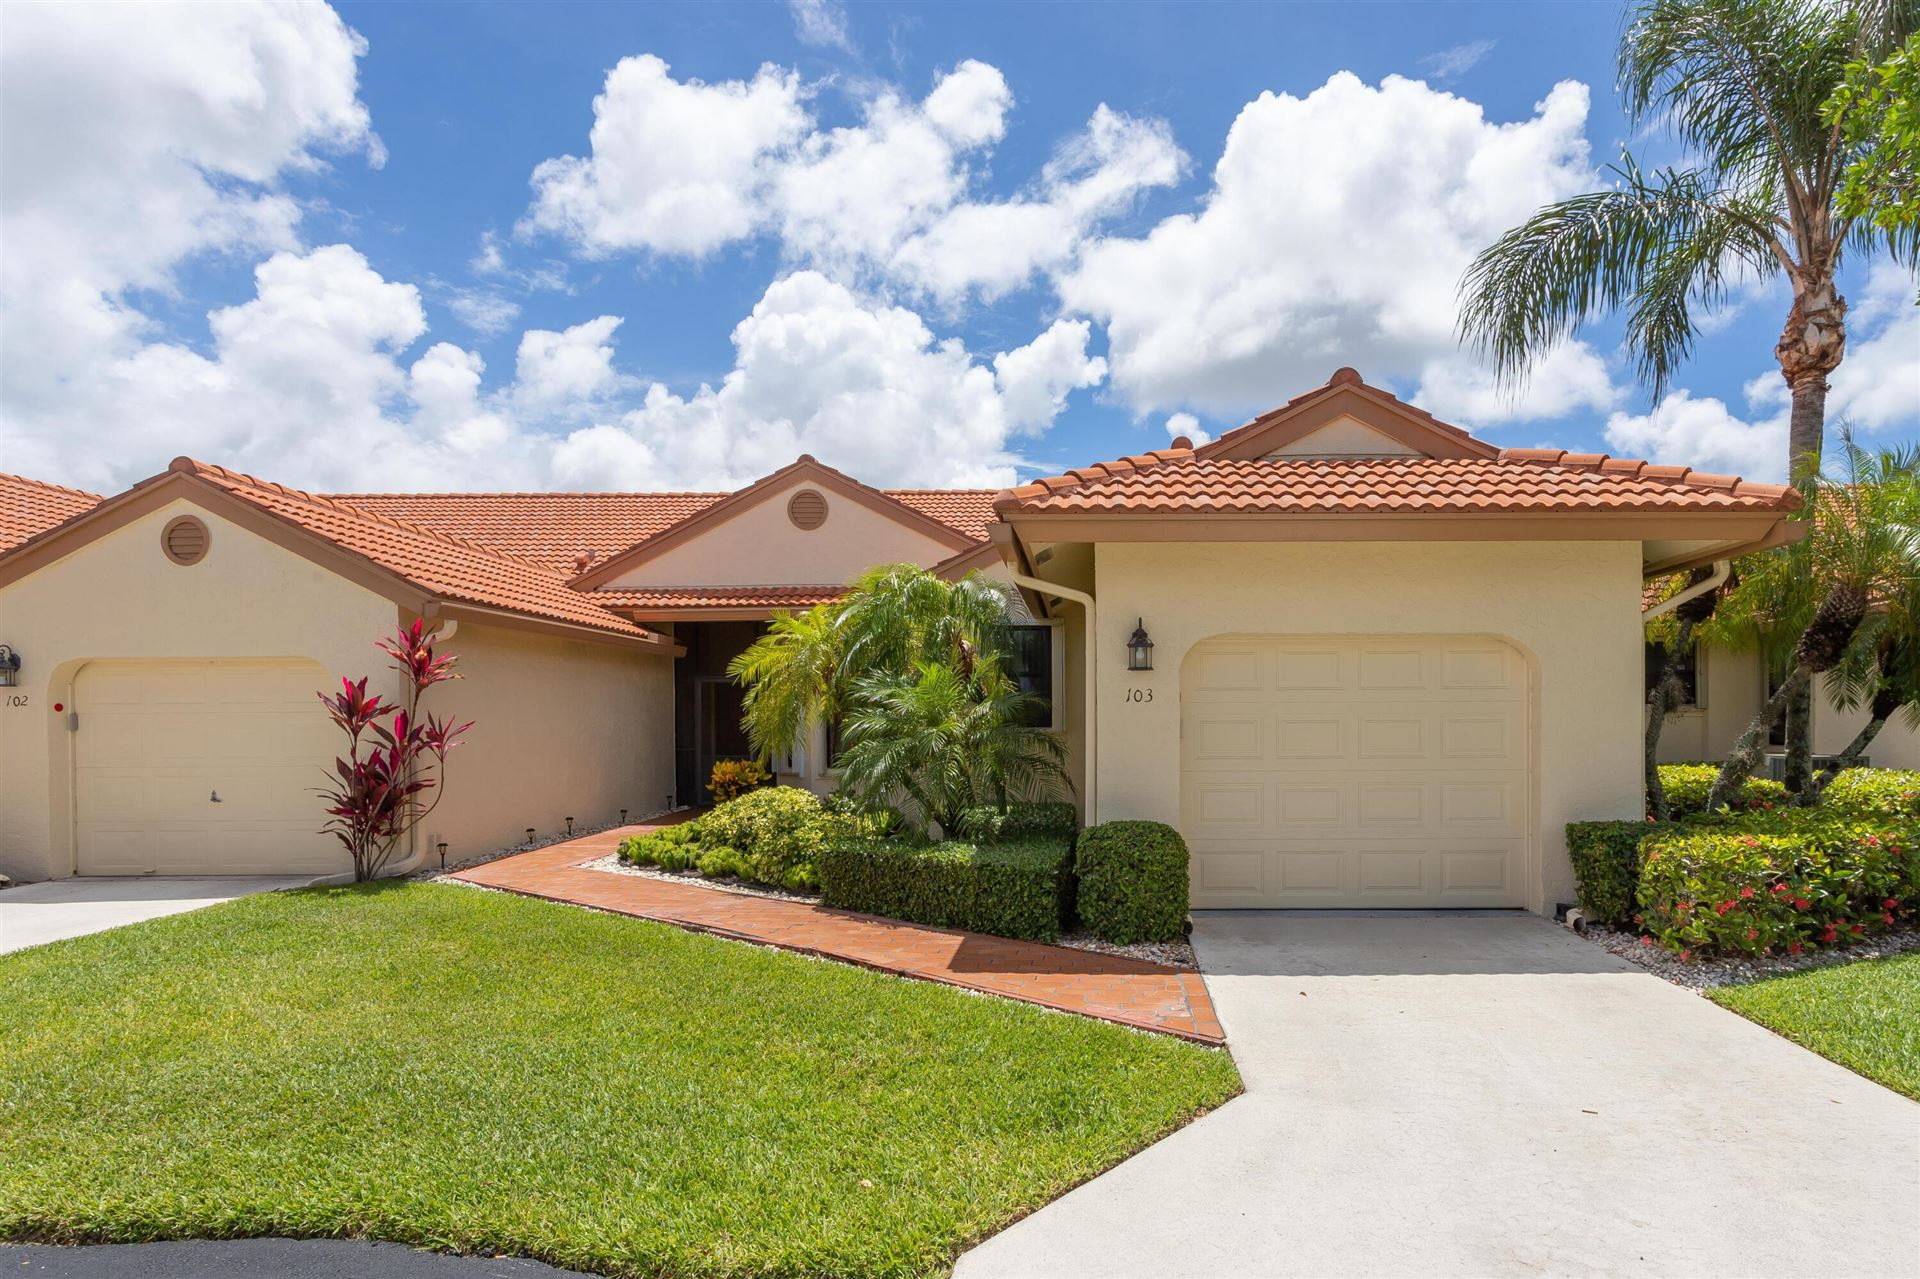 8280 Waterline Drive #103, Boynton Beach, FL 33472 - MLS#: RX-10719936